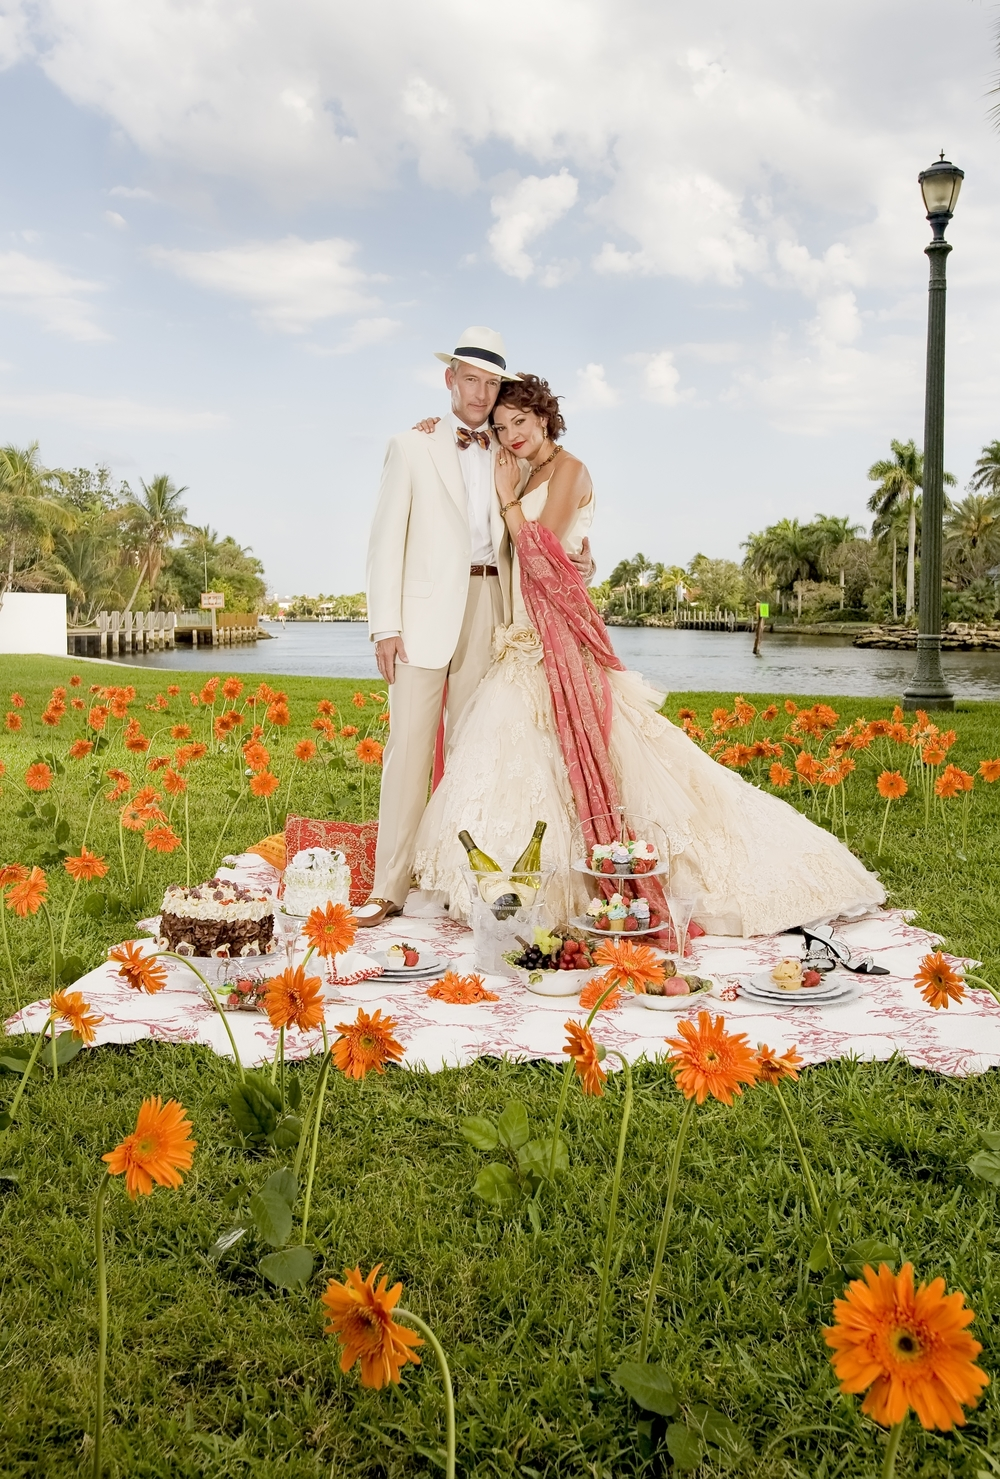 Wedding _KLP6593.JPG